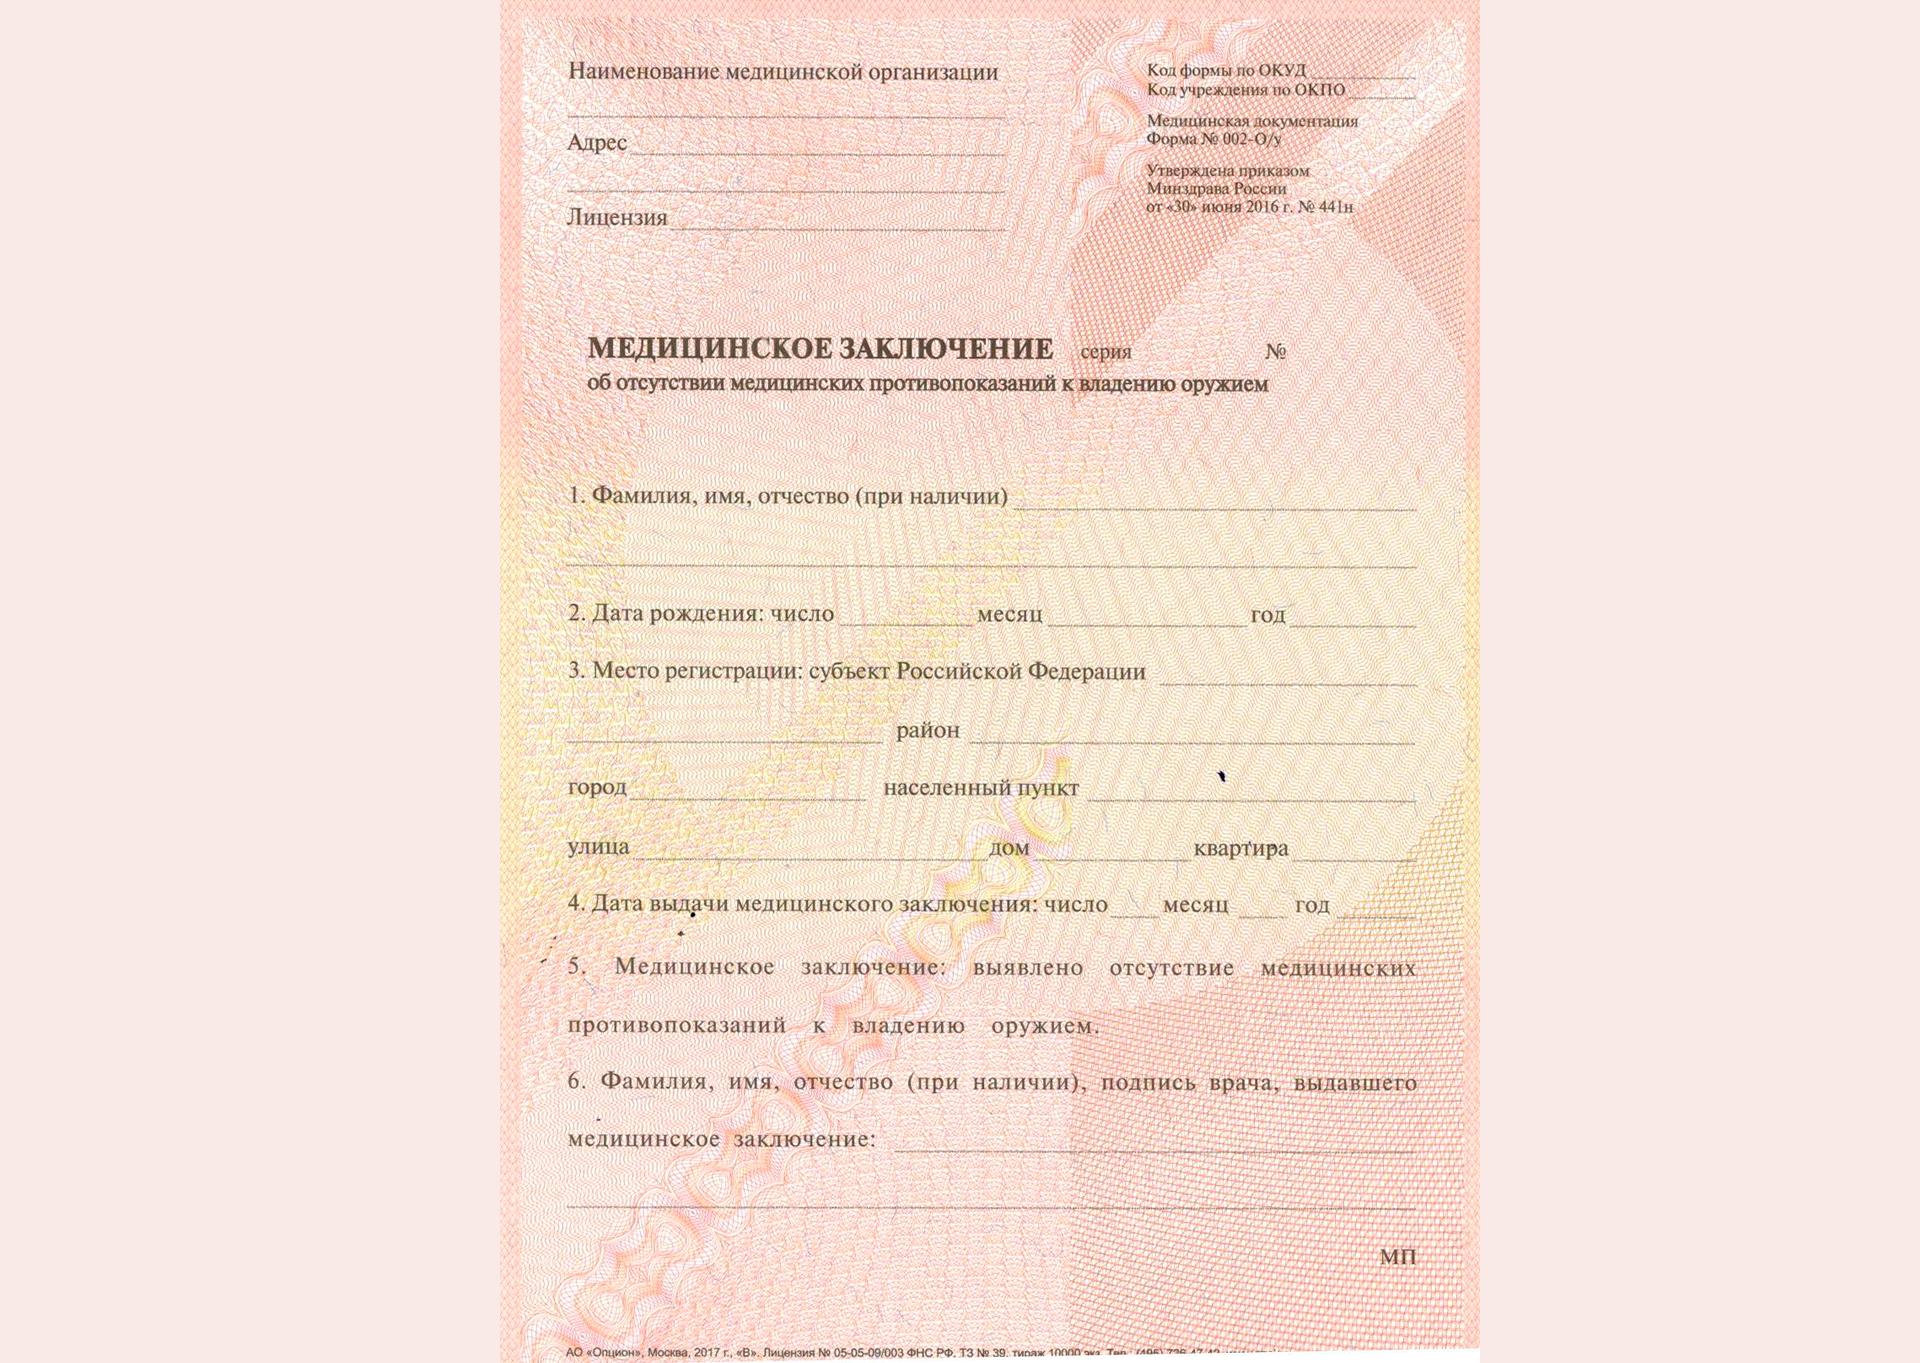 Справка 002 о у Волгоградский проспект функция анализа крови